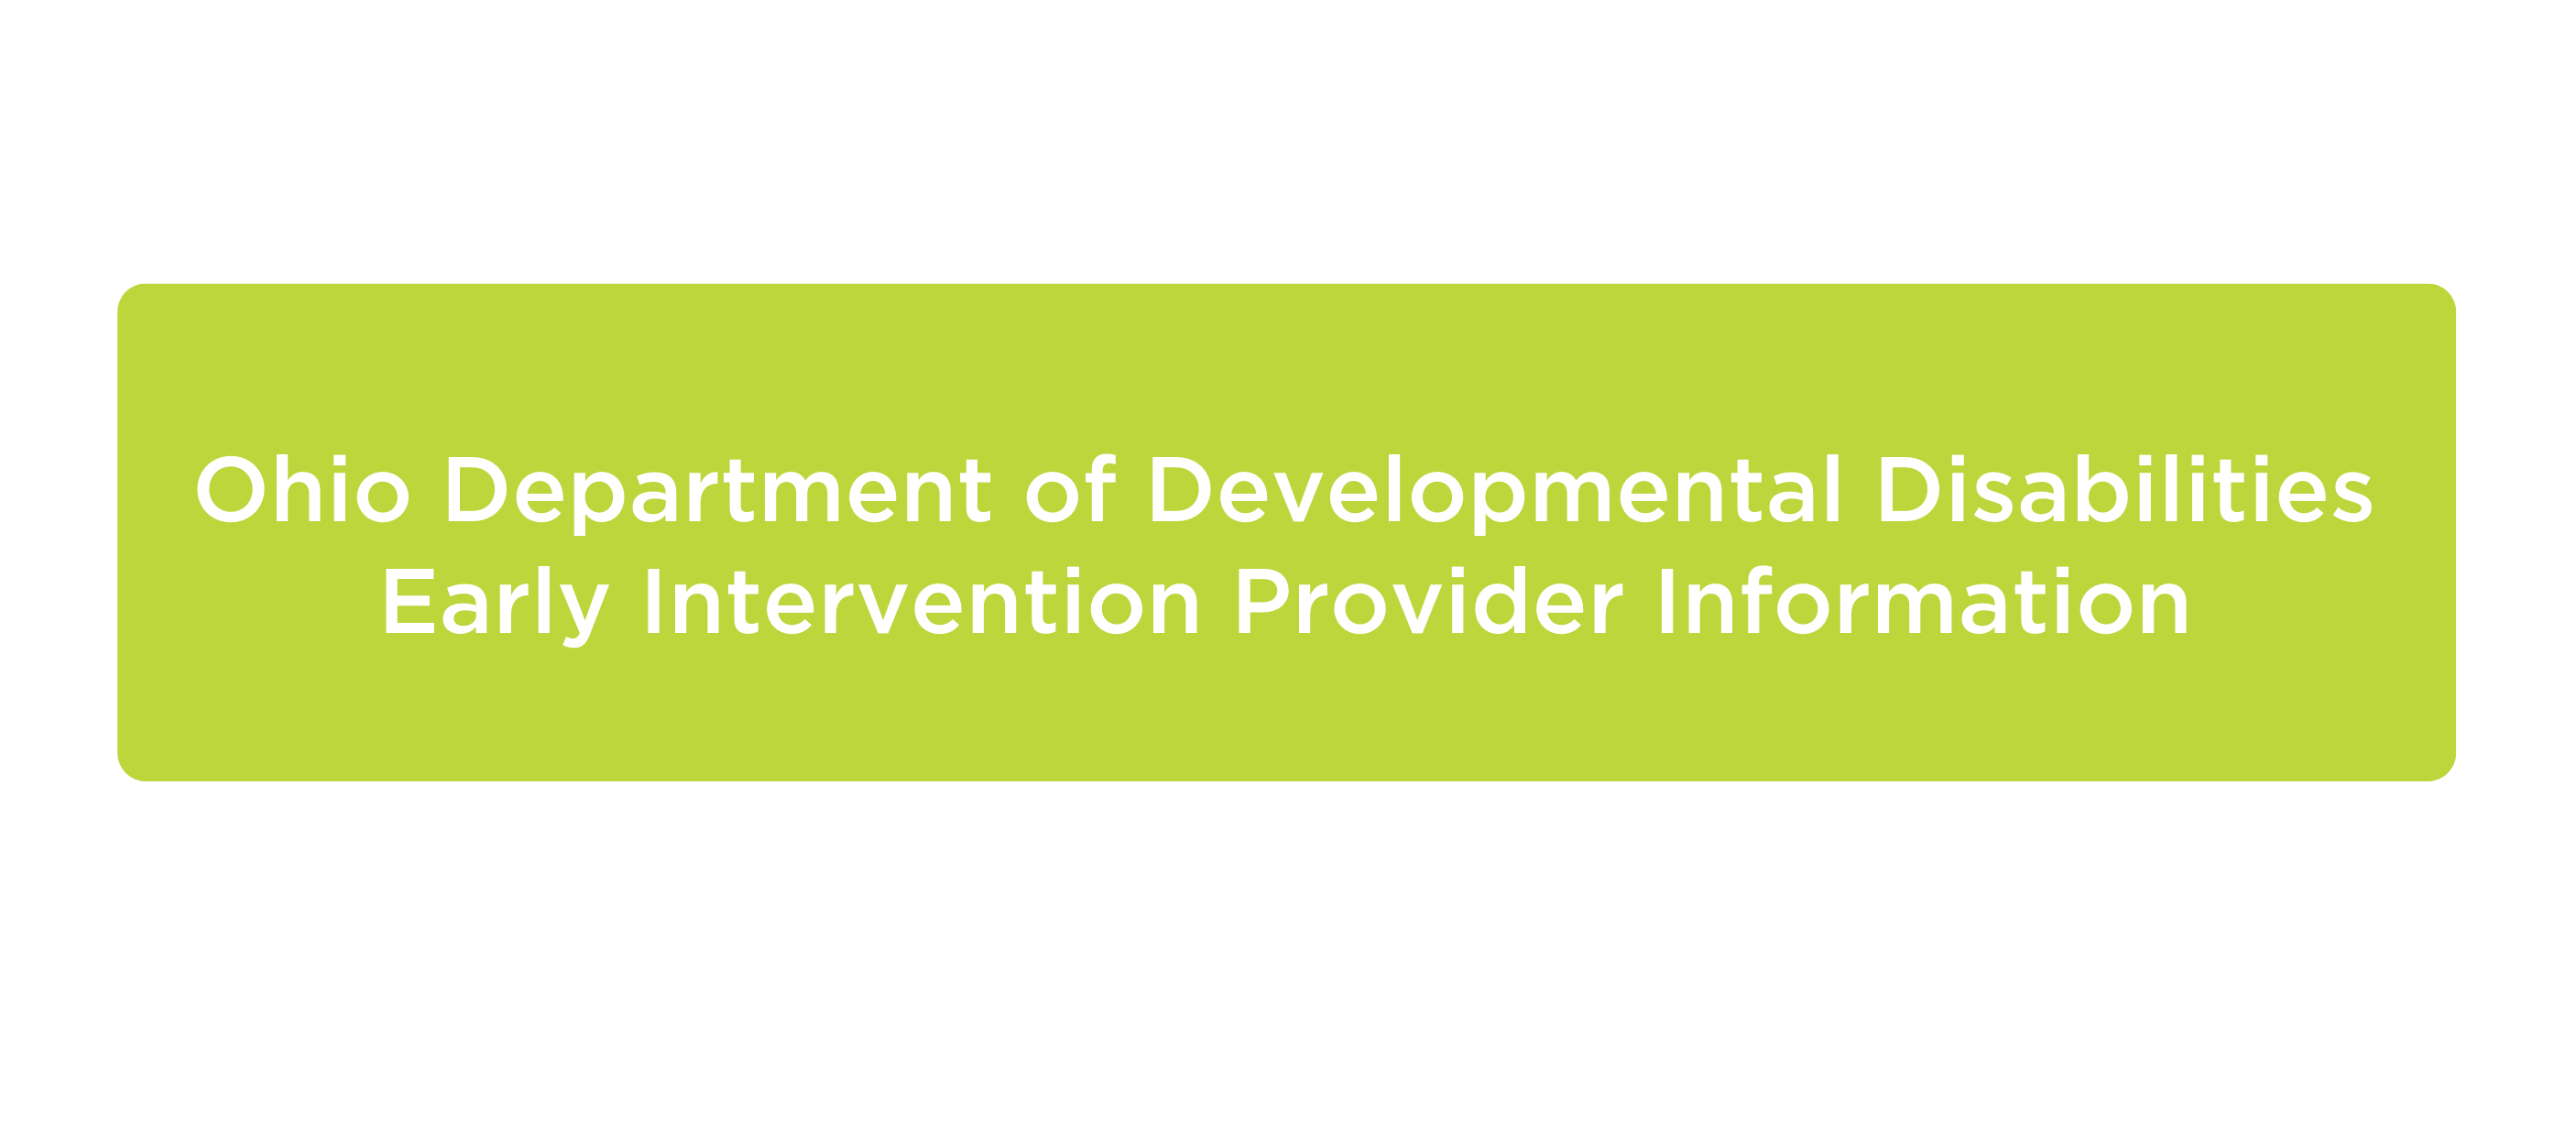 Department of Developmental Disabilities provider information